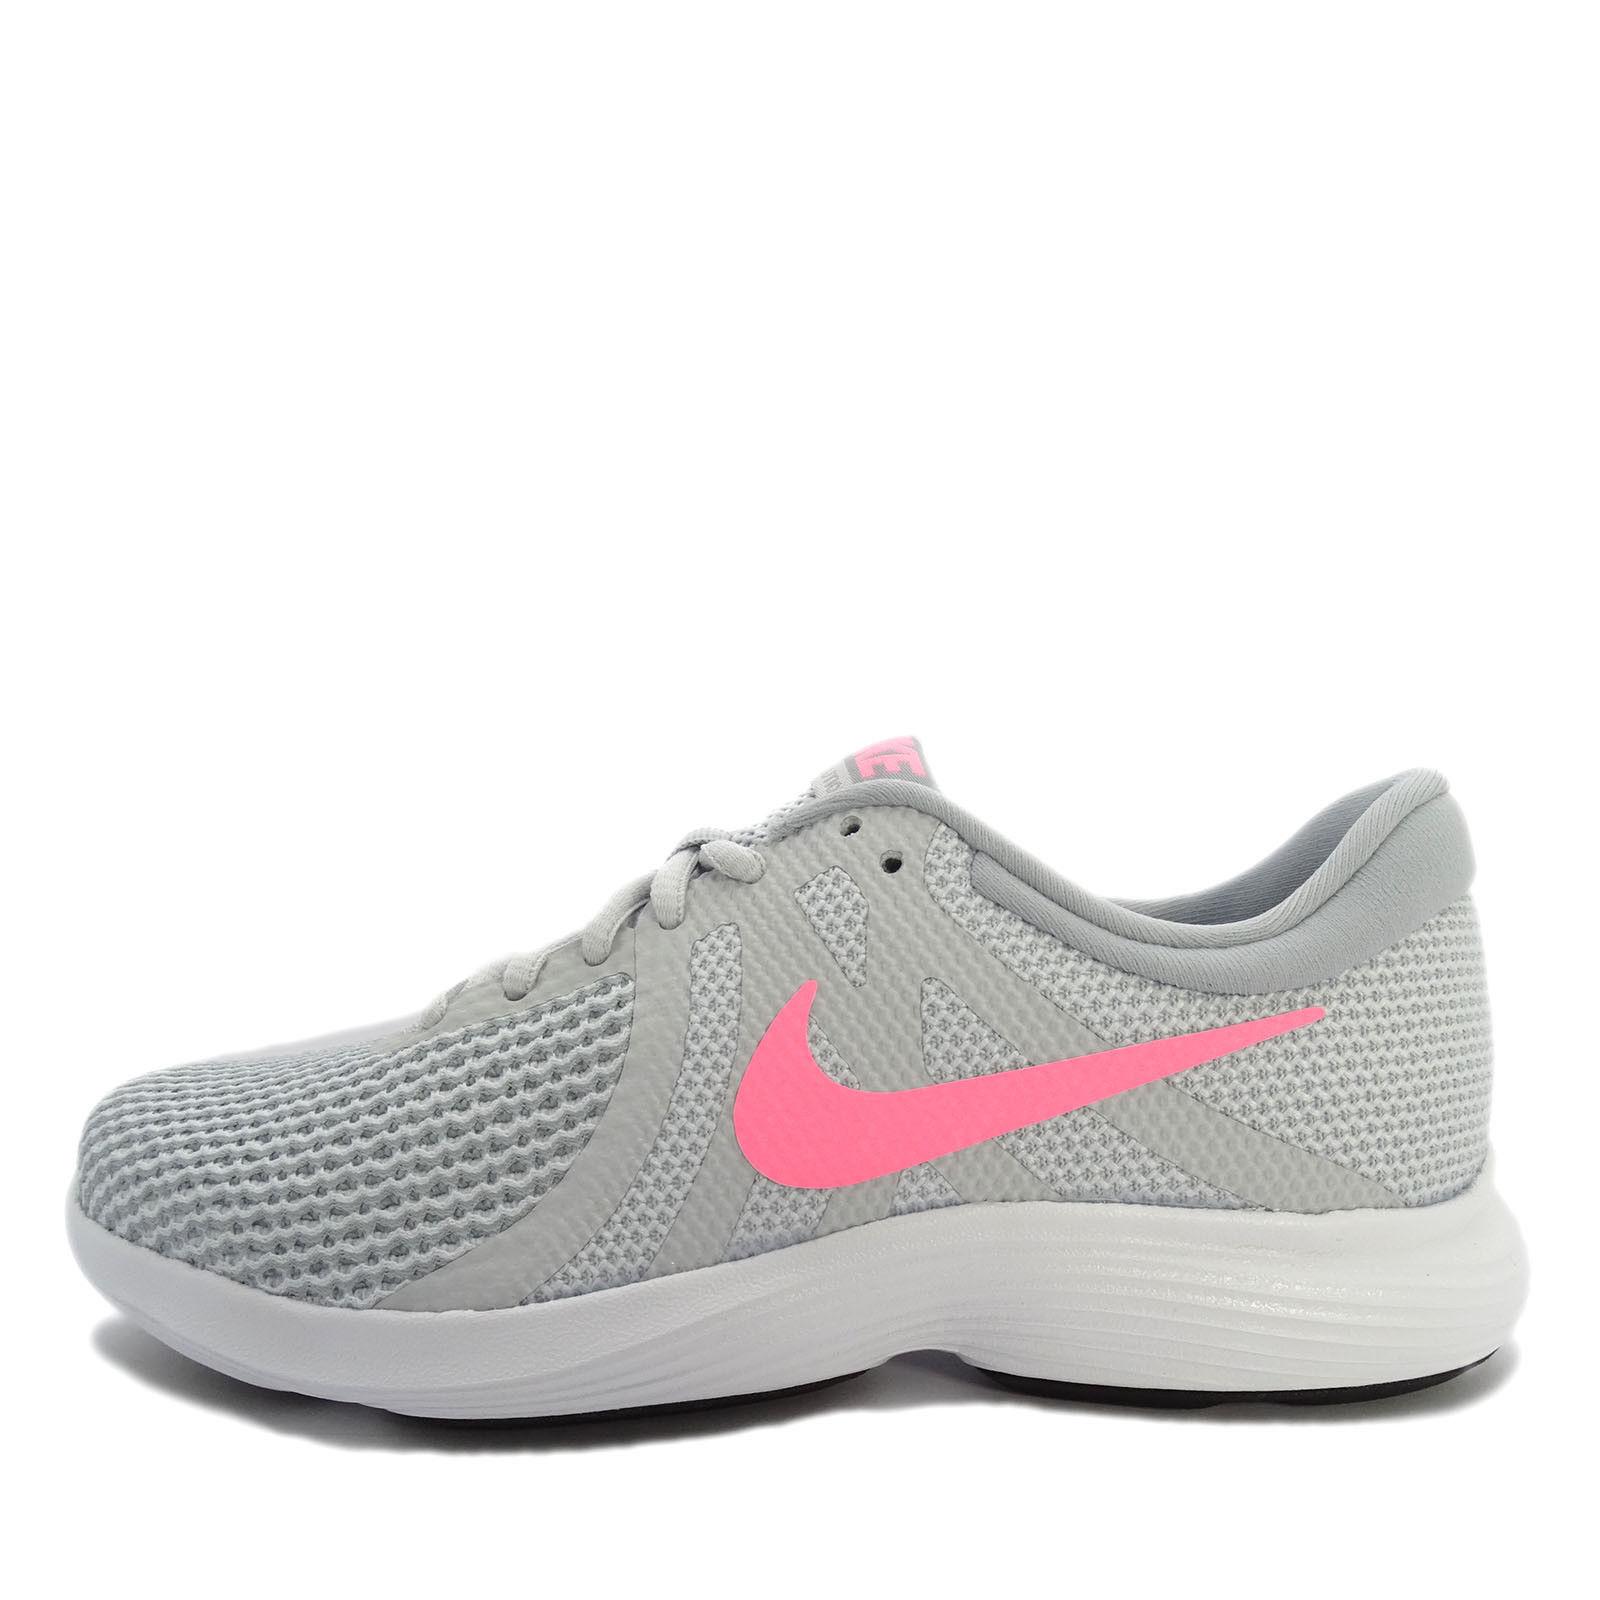 Nike rivoluzione 4 donne scarpe da corsa di platino / sunset - 39